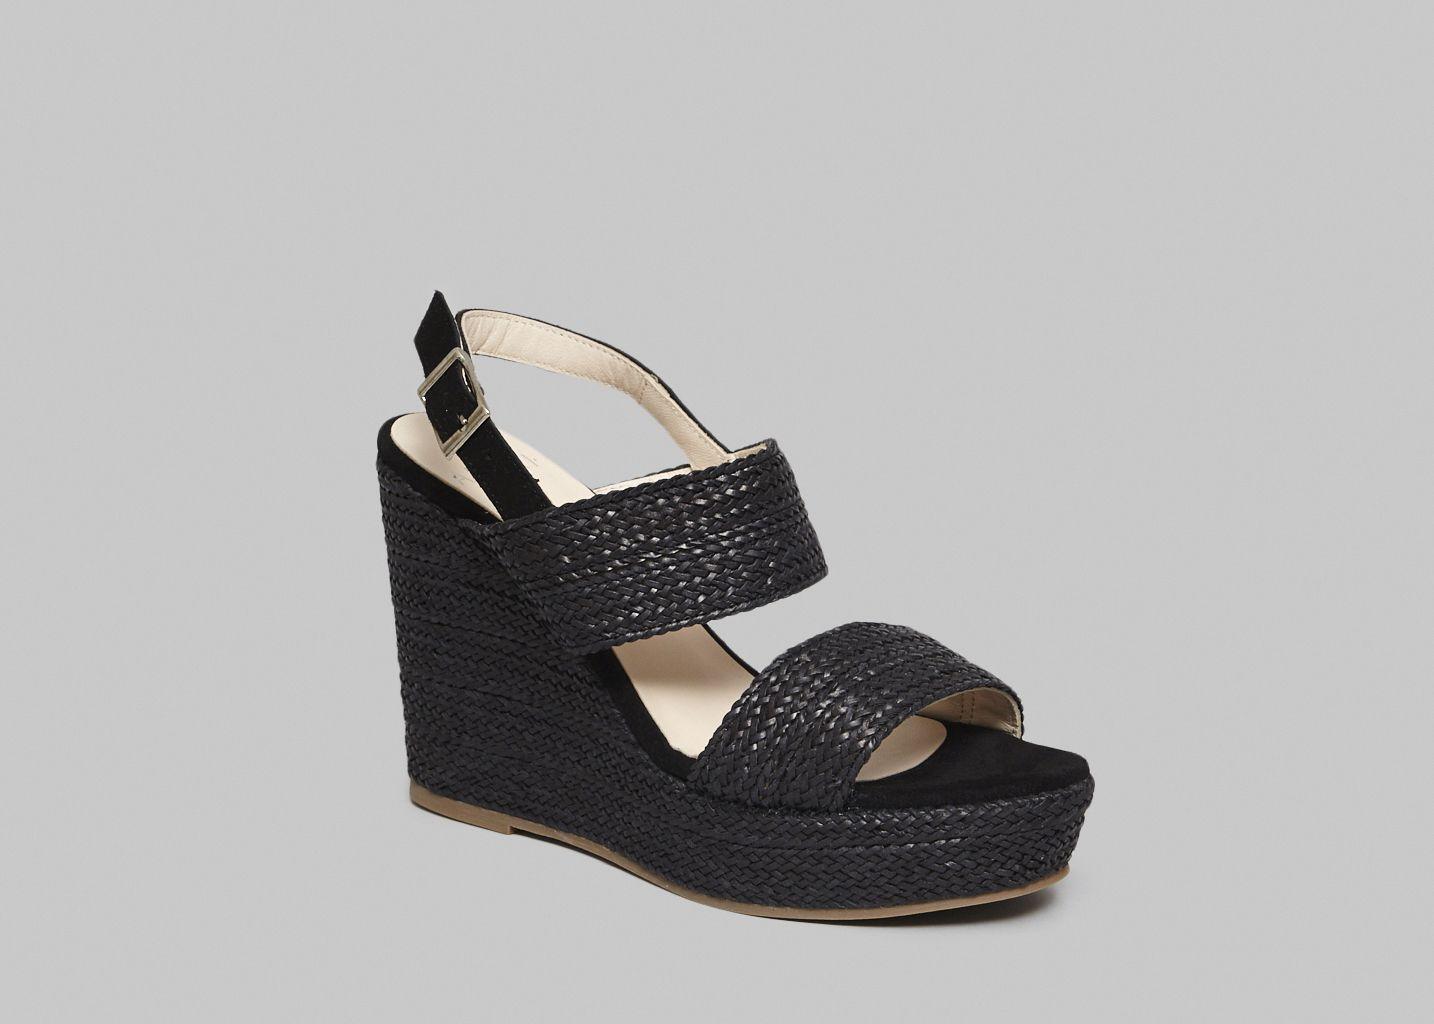 Sandales Tropic - Anaki